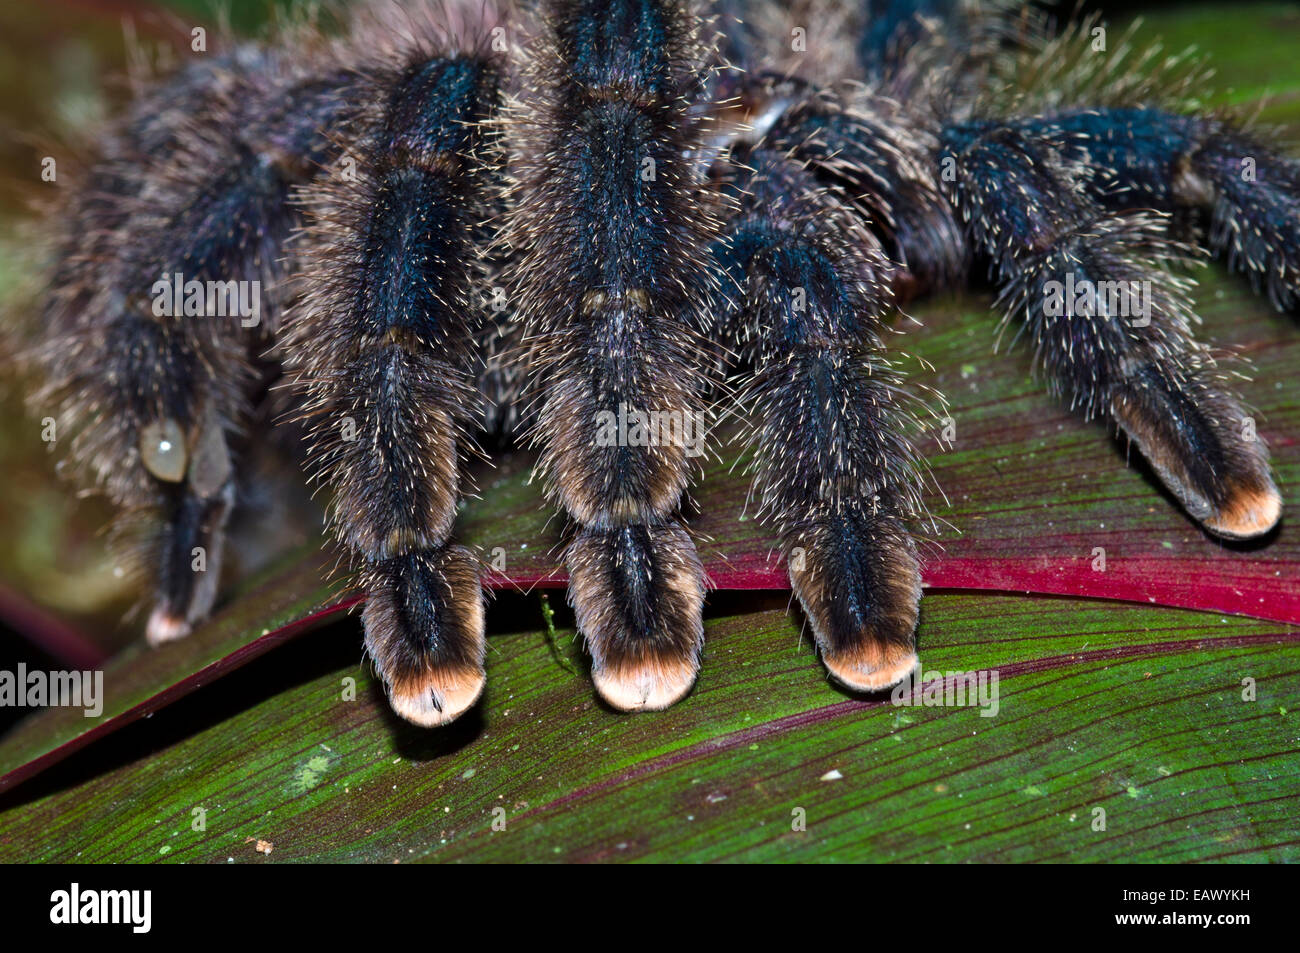 The hairy segmented legs and pink feet of a Pinktoe Tarantula. - Stock Image